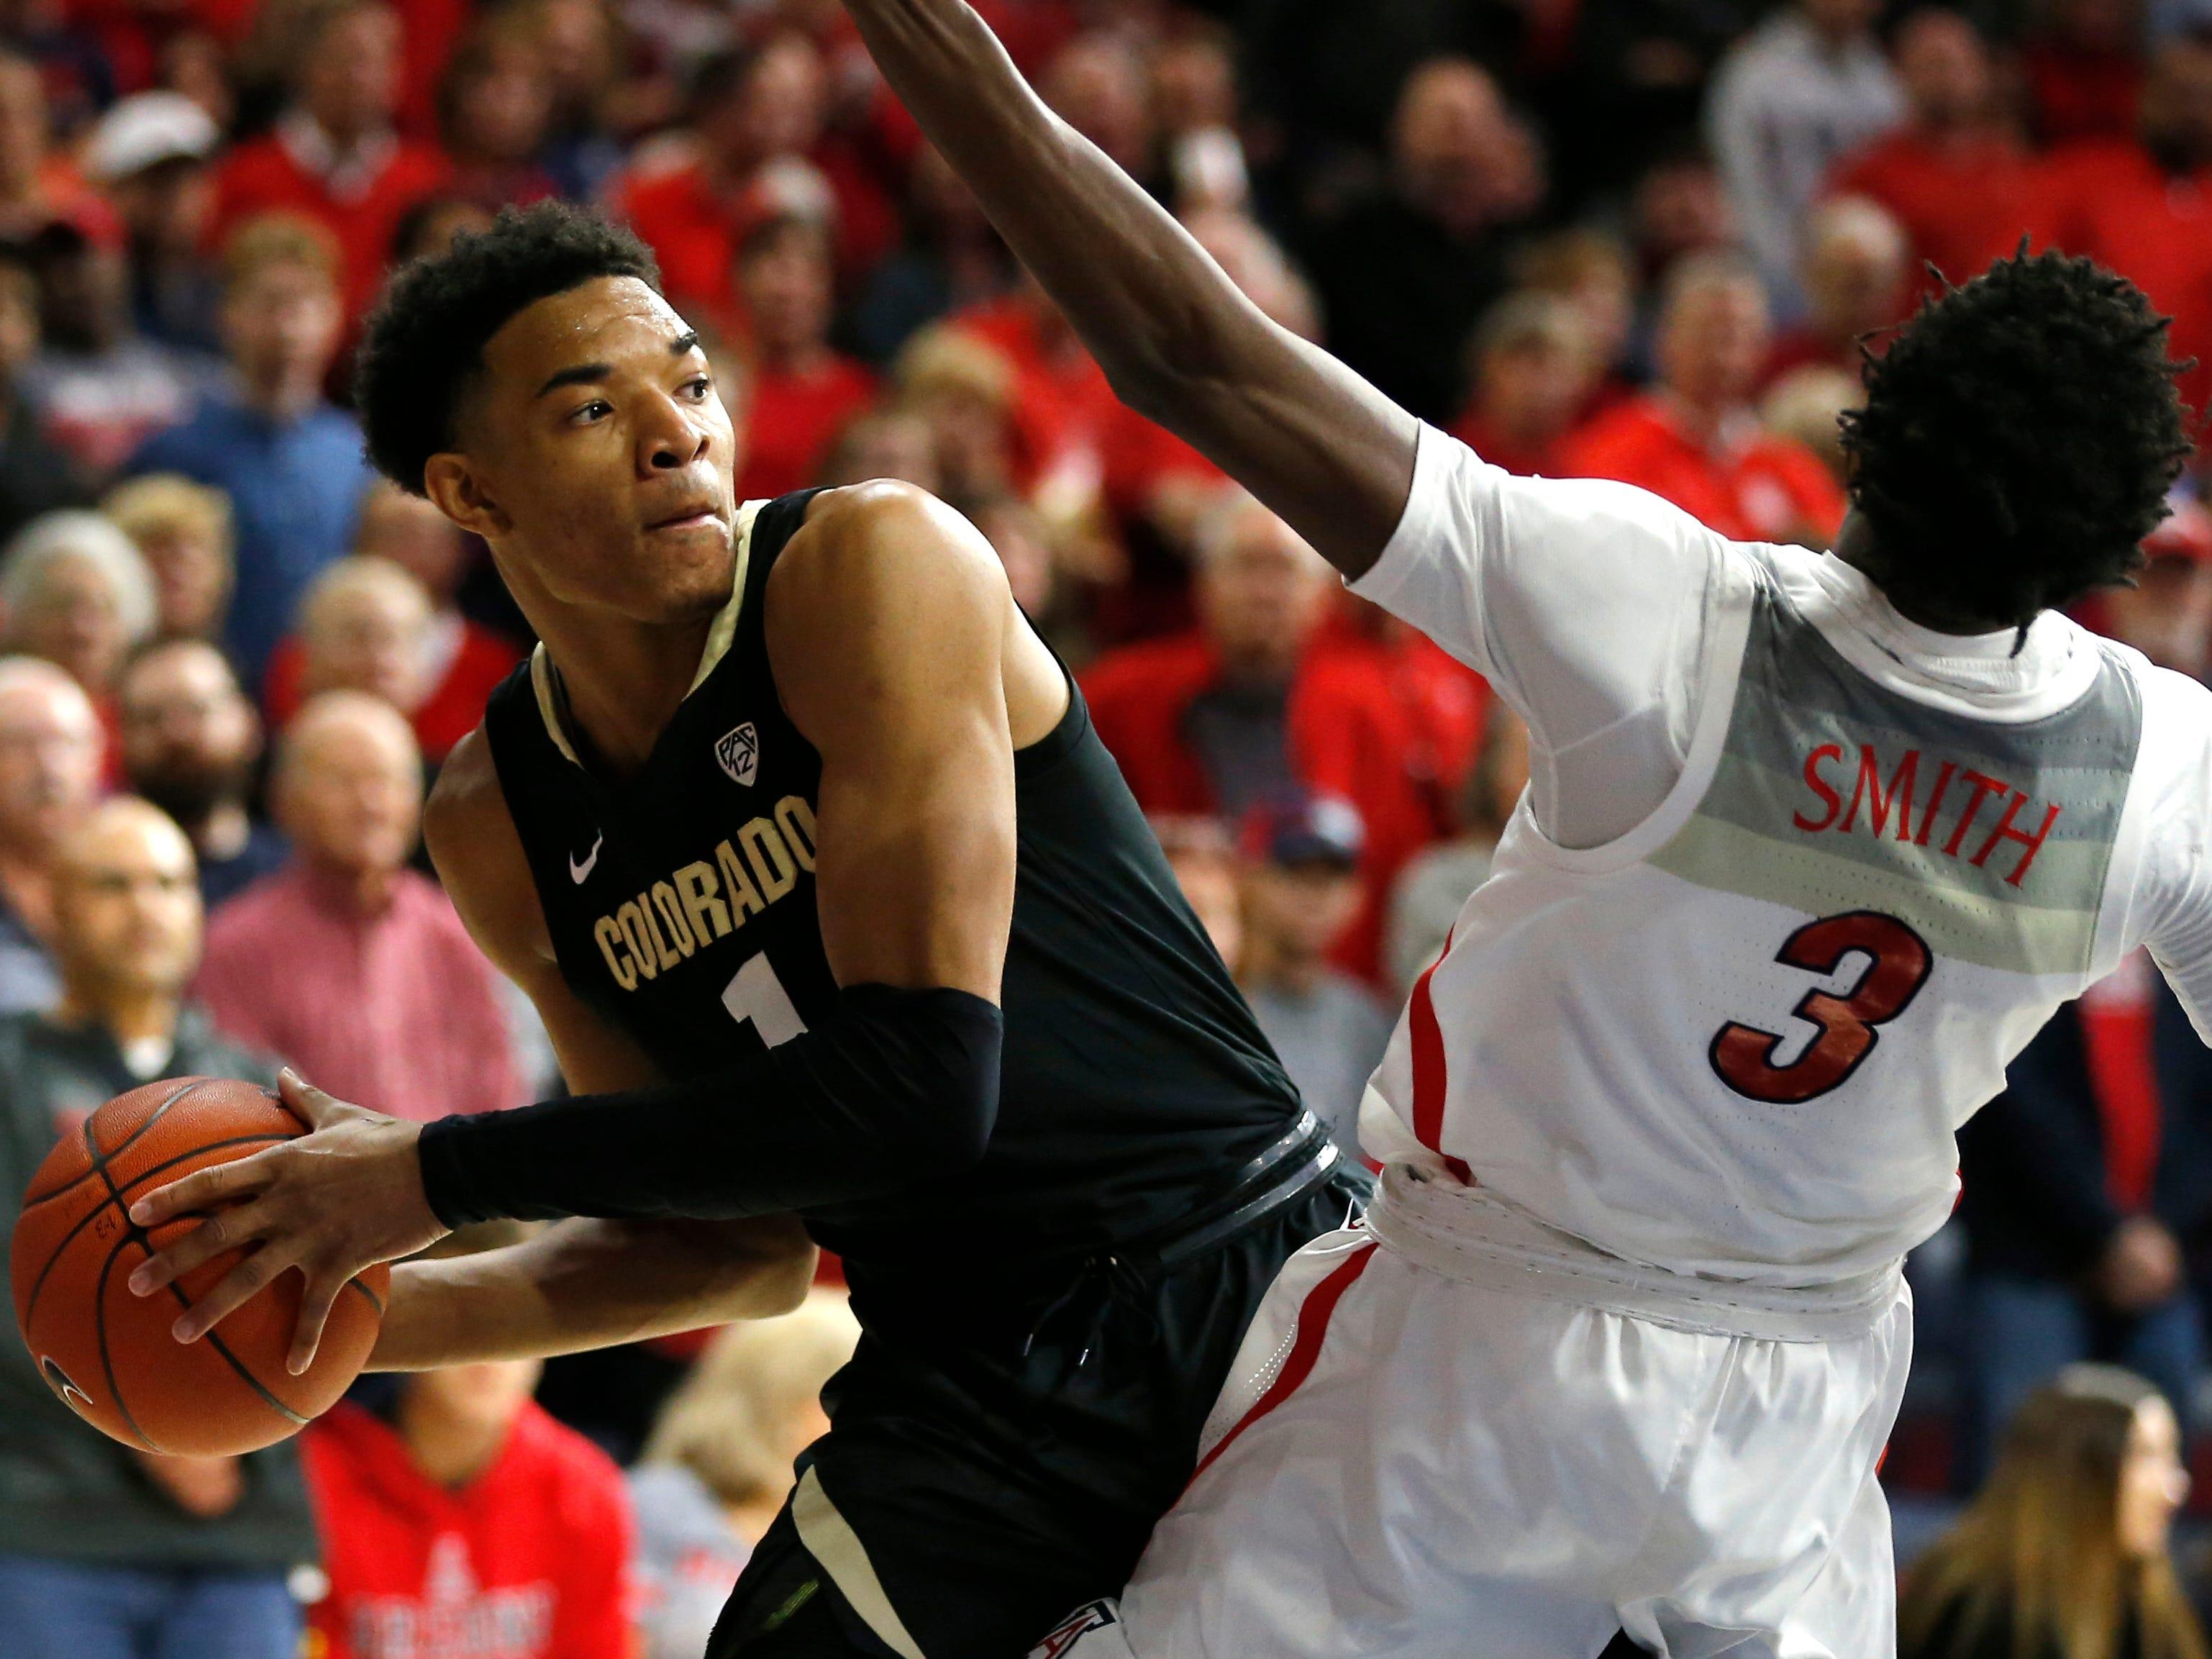 Colorado guard Tyler Bey (1) in the first half during an NCAA college basketball game against Arizona, Thursday, Jan. 3, 2019, in Tucson, Ariz. (AP Photo/Rick Scuteri)